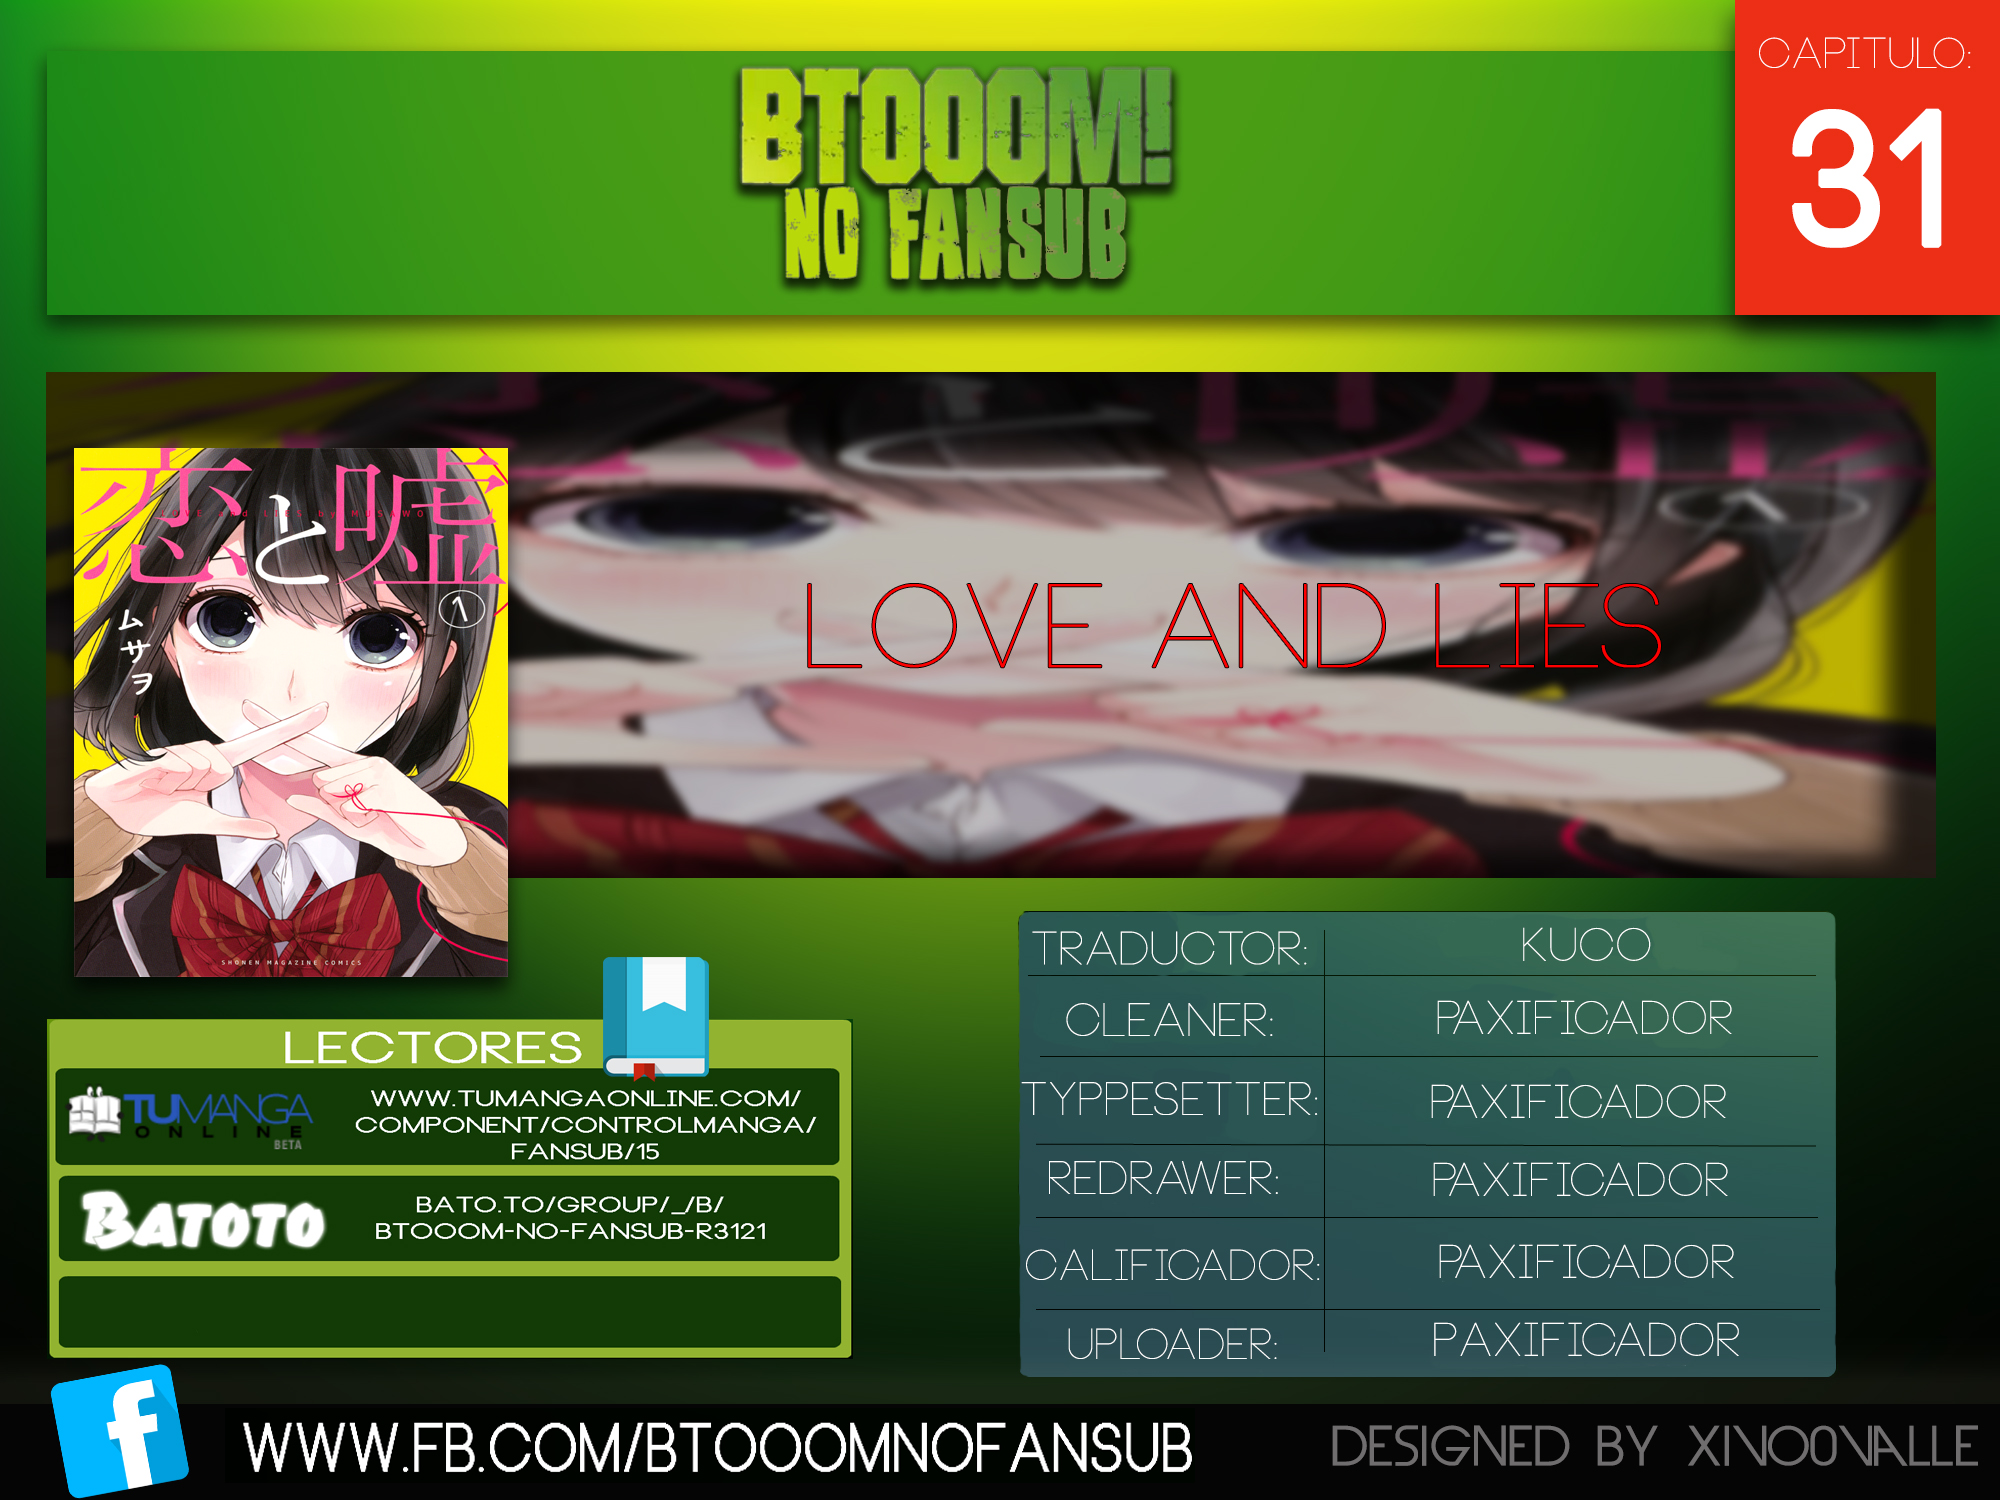 http://c5.ninemanga.com/es_manga/14/14734/361012/1fa45560203c0ddd8267bfbd029d49c3.jpg Page 1